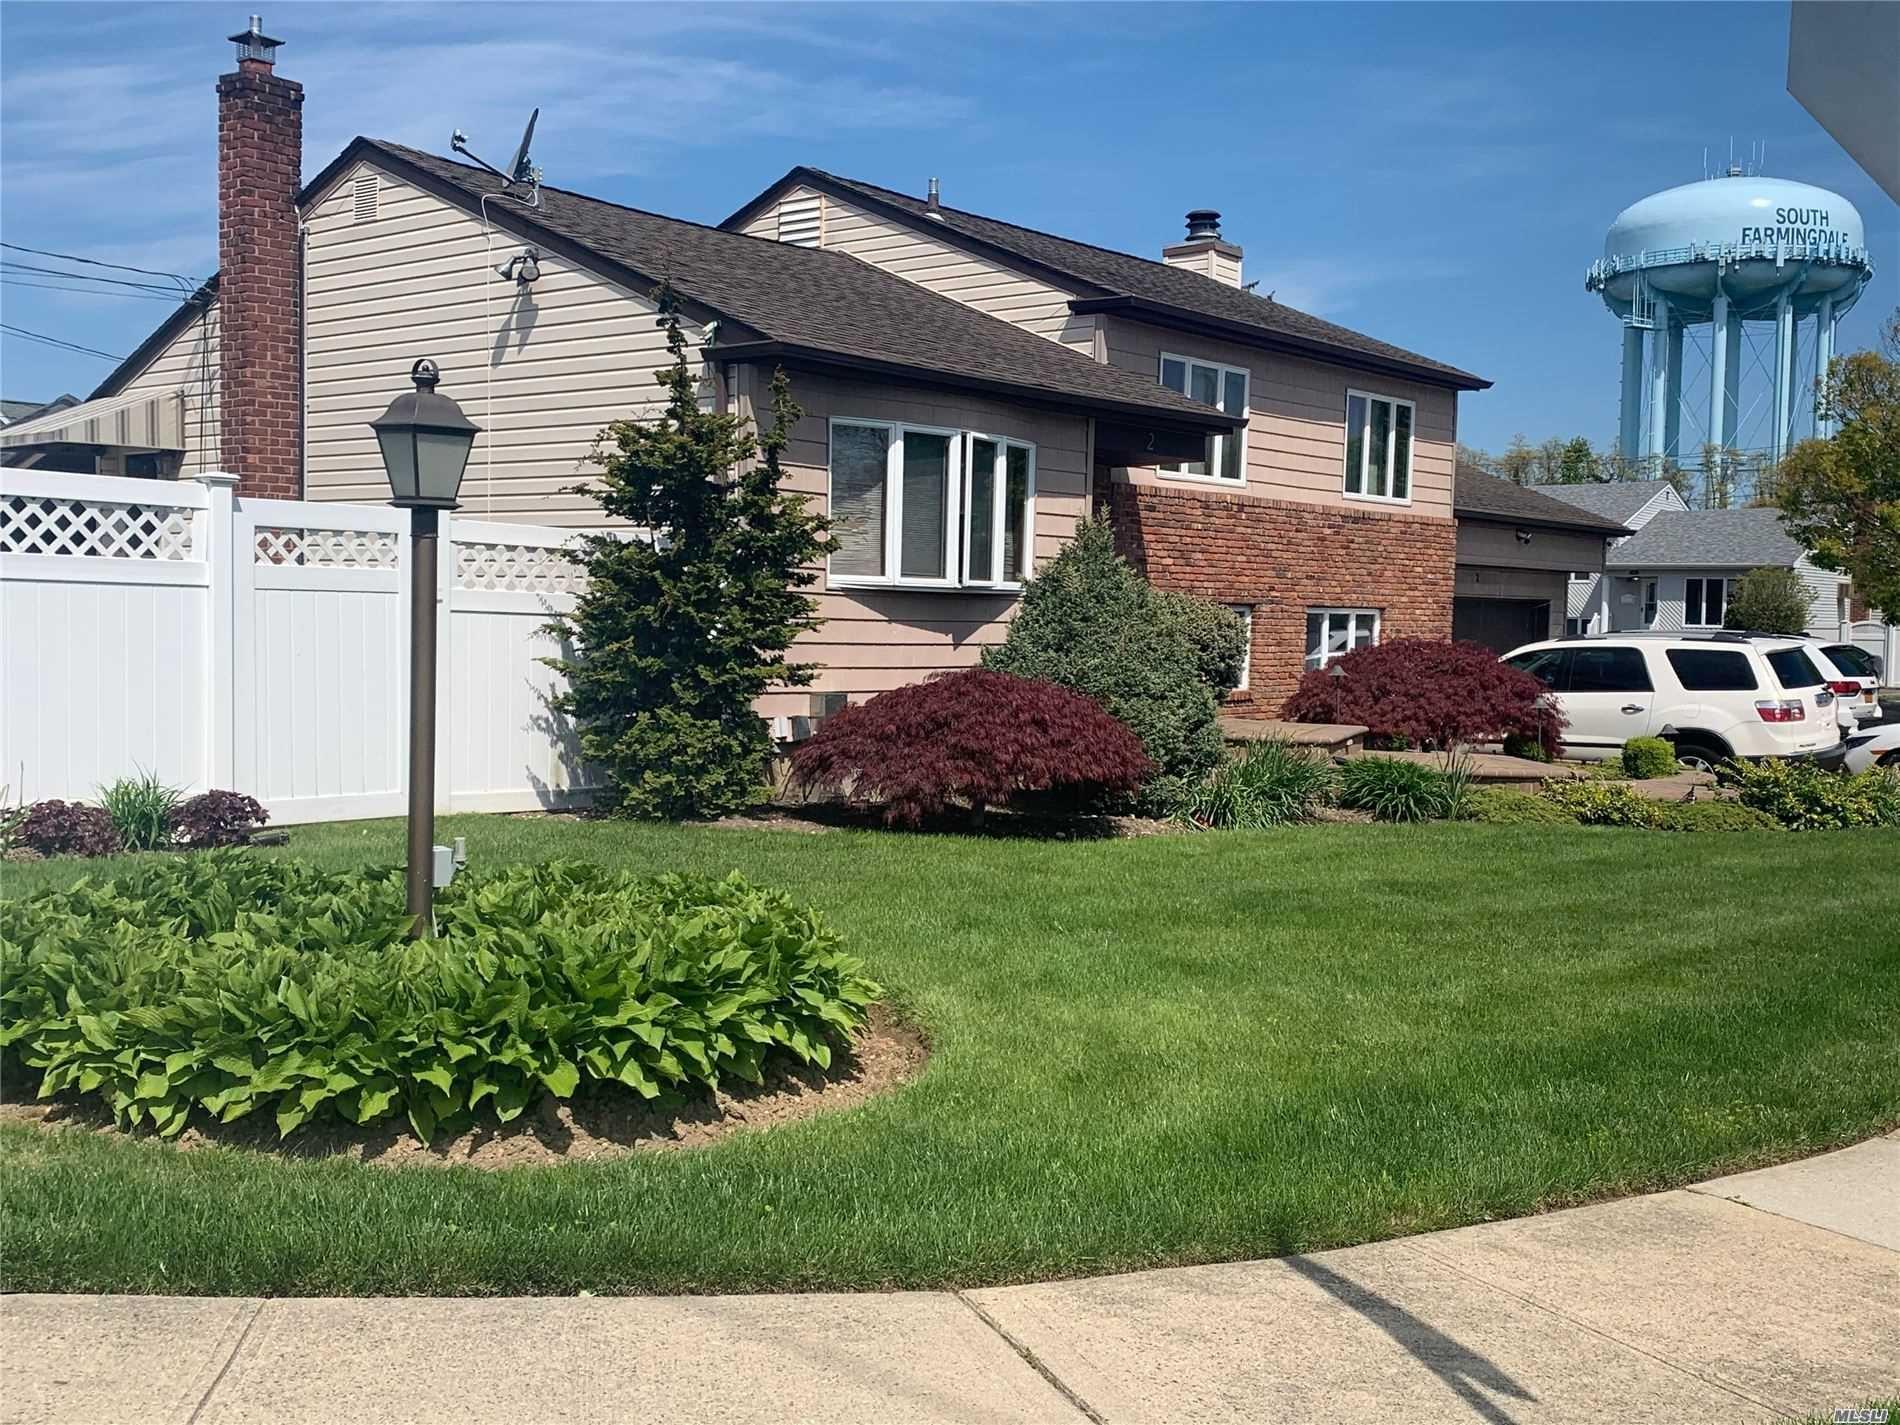 2 Lenore Lane, Farmingdale, NY 11735 - MLS#: 3214427